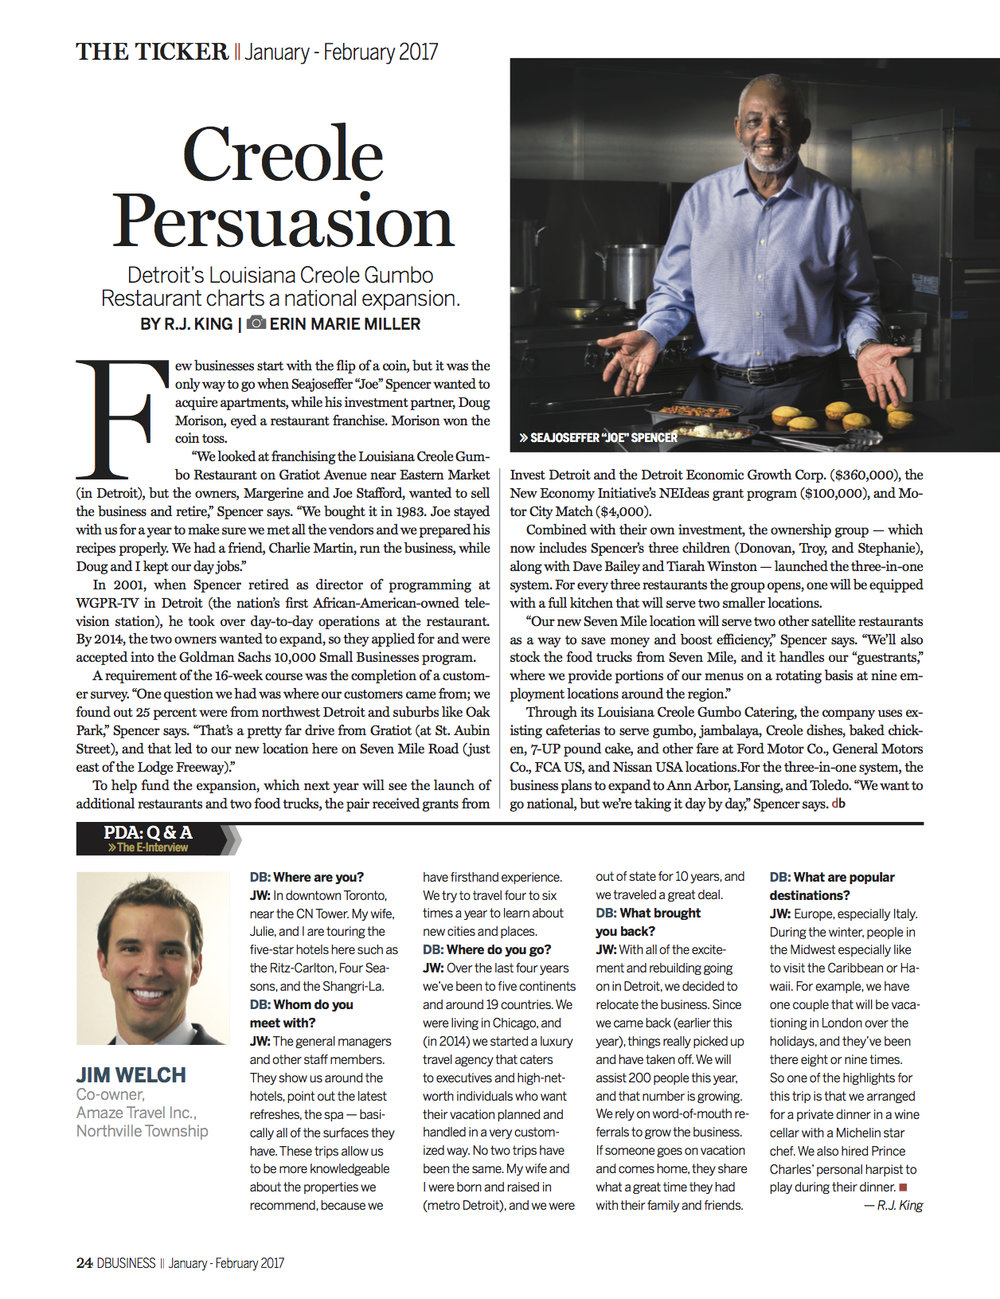 DBUSINESS Magazine -